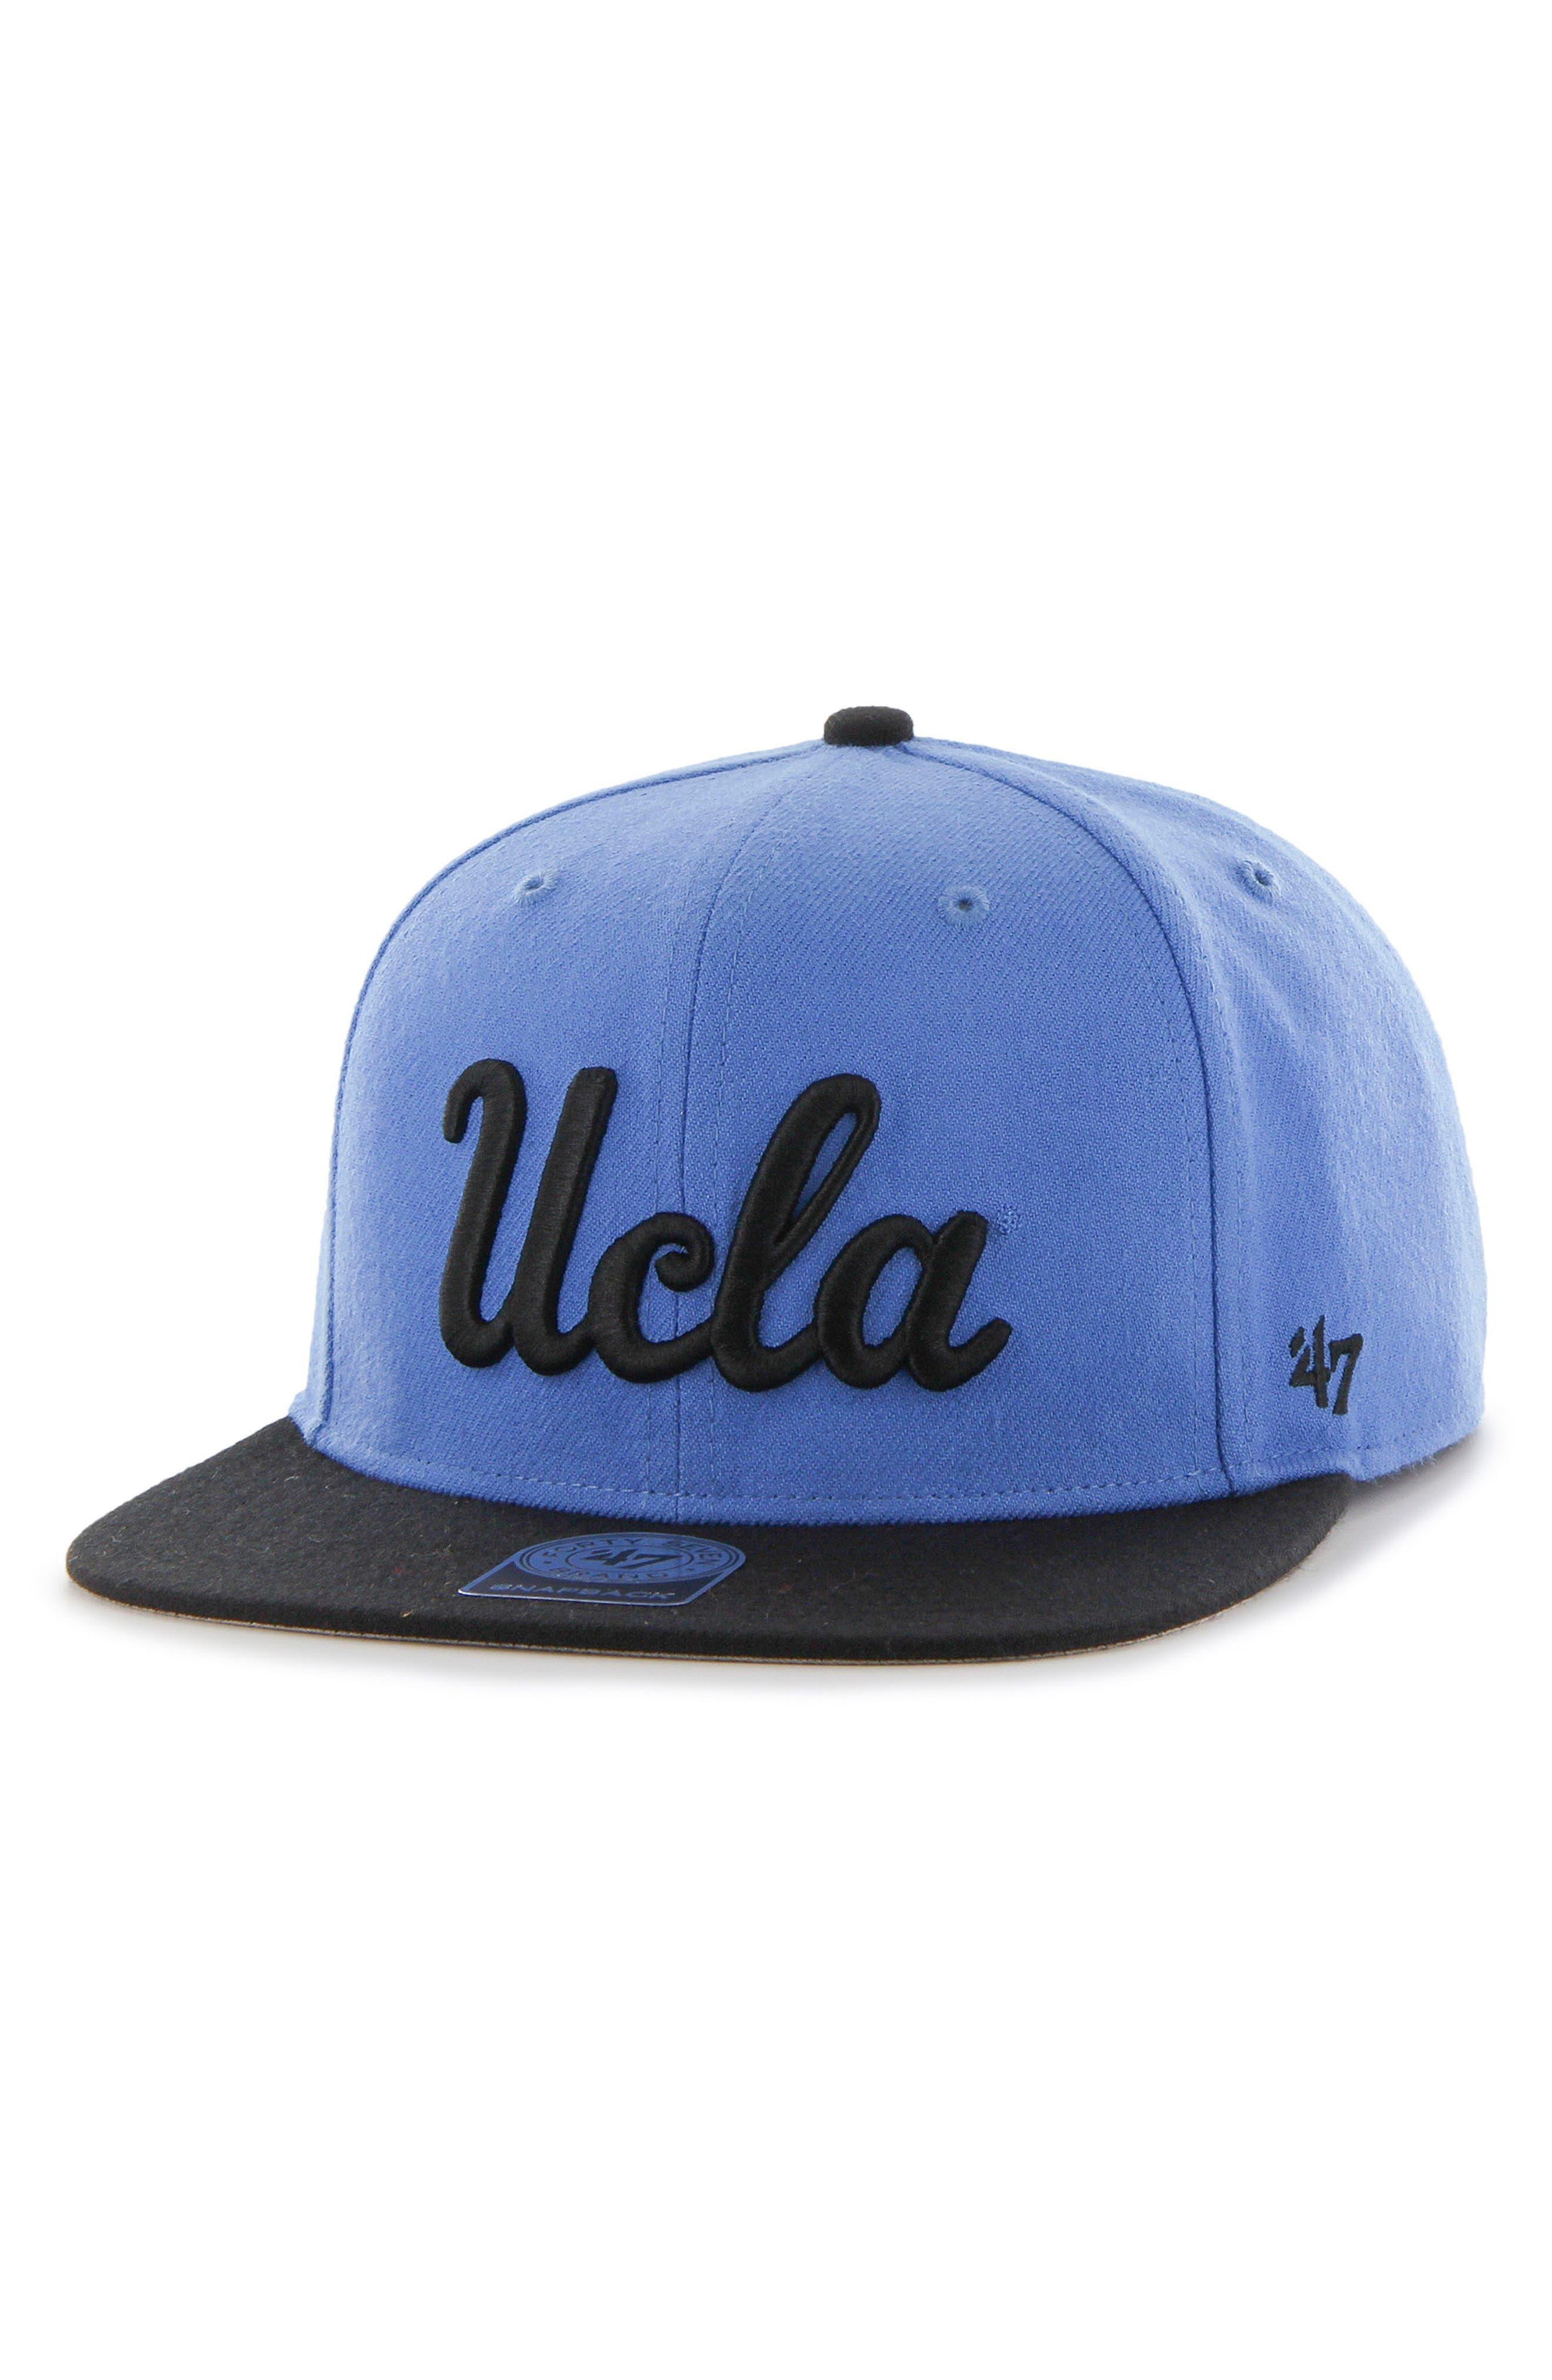 Collegiate Two Tone Wool Cap,                             Main thumbnail 1, color,                             Blue Ucla Bruins